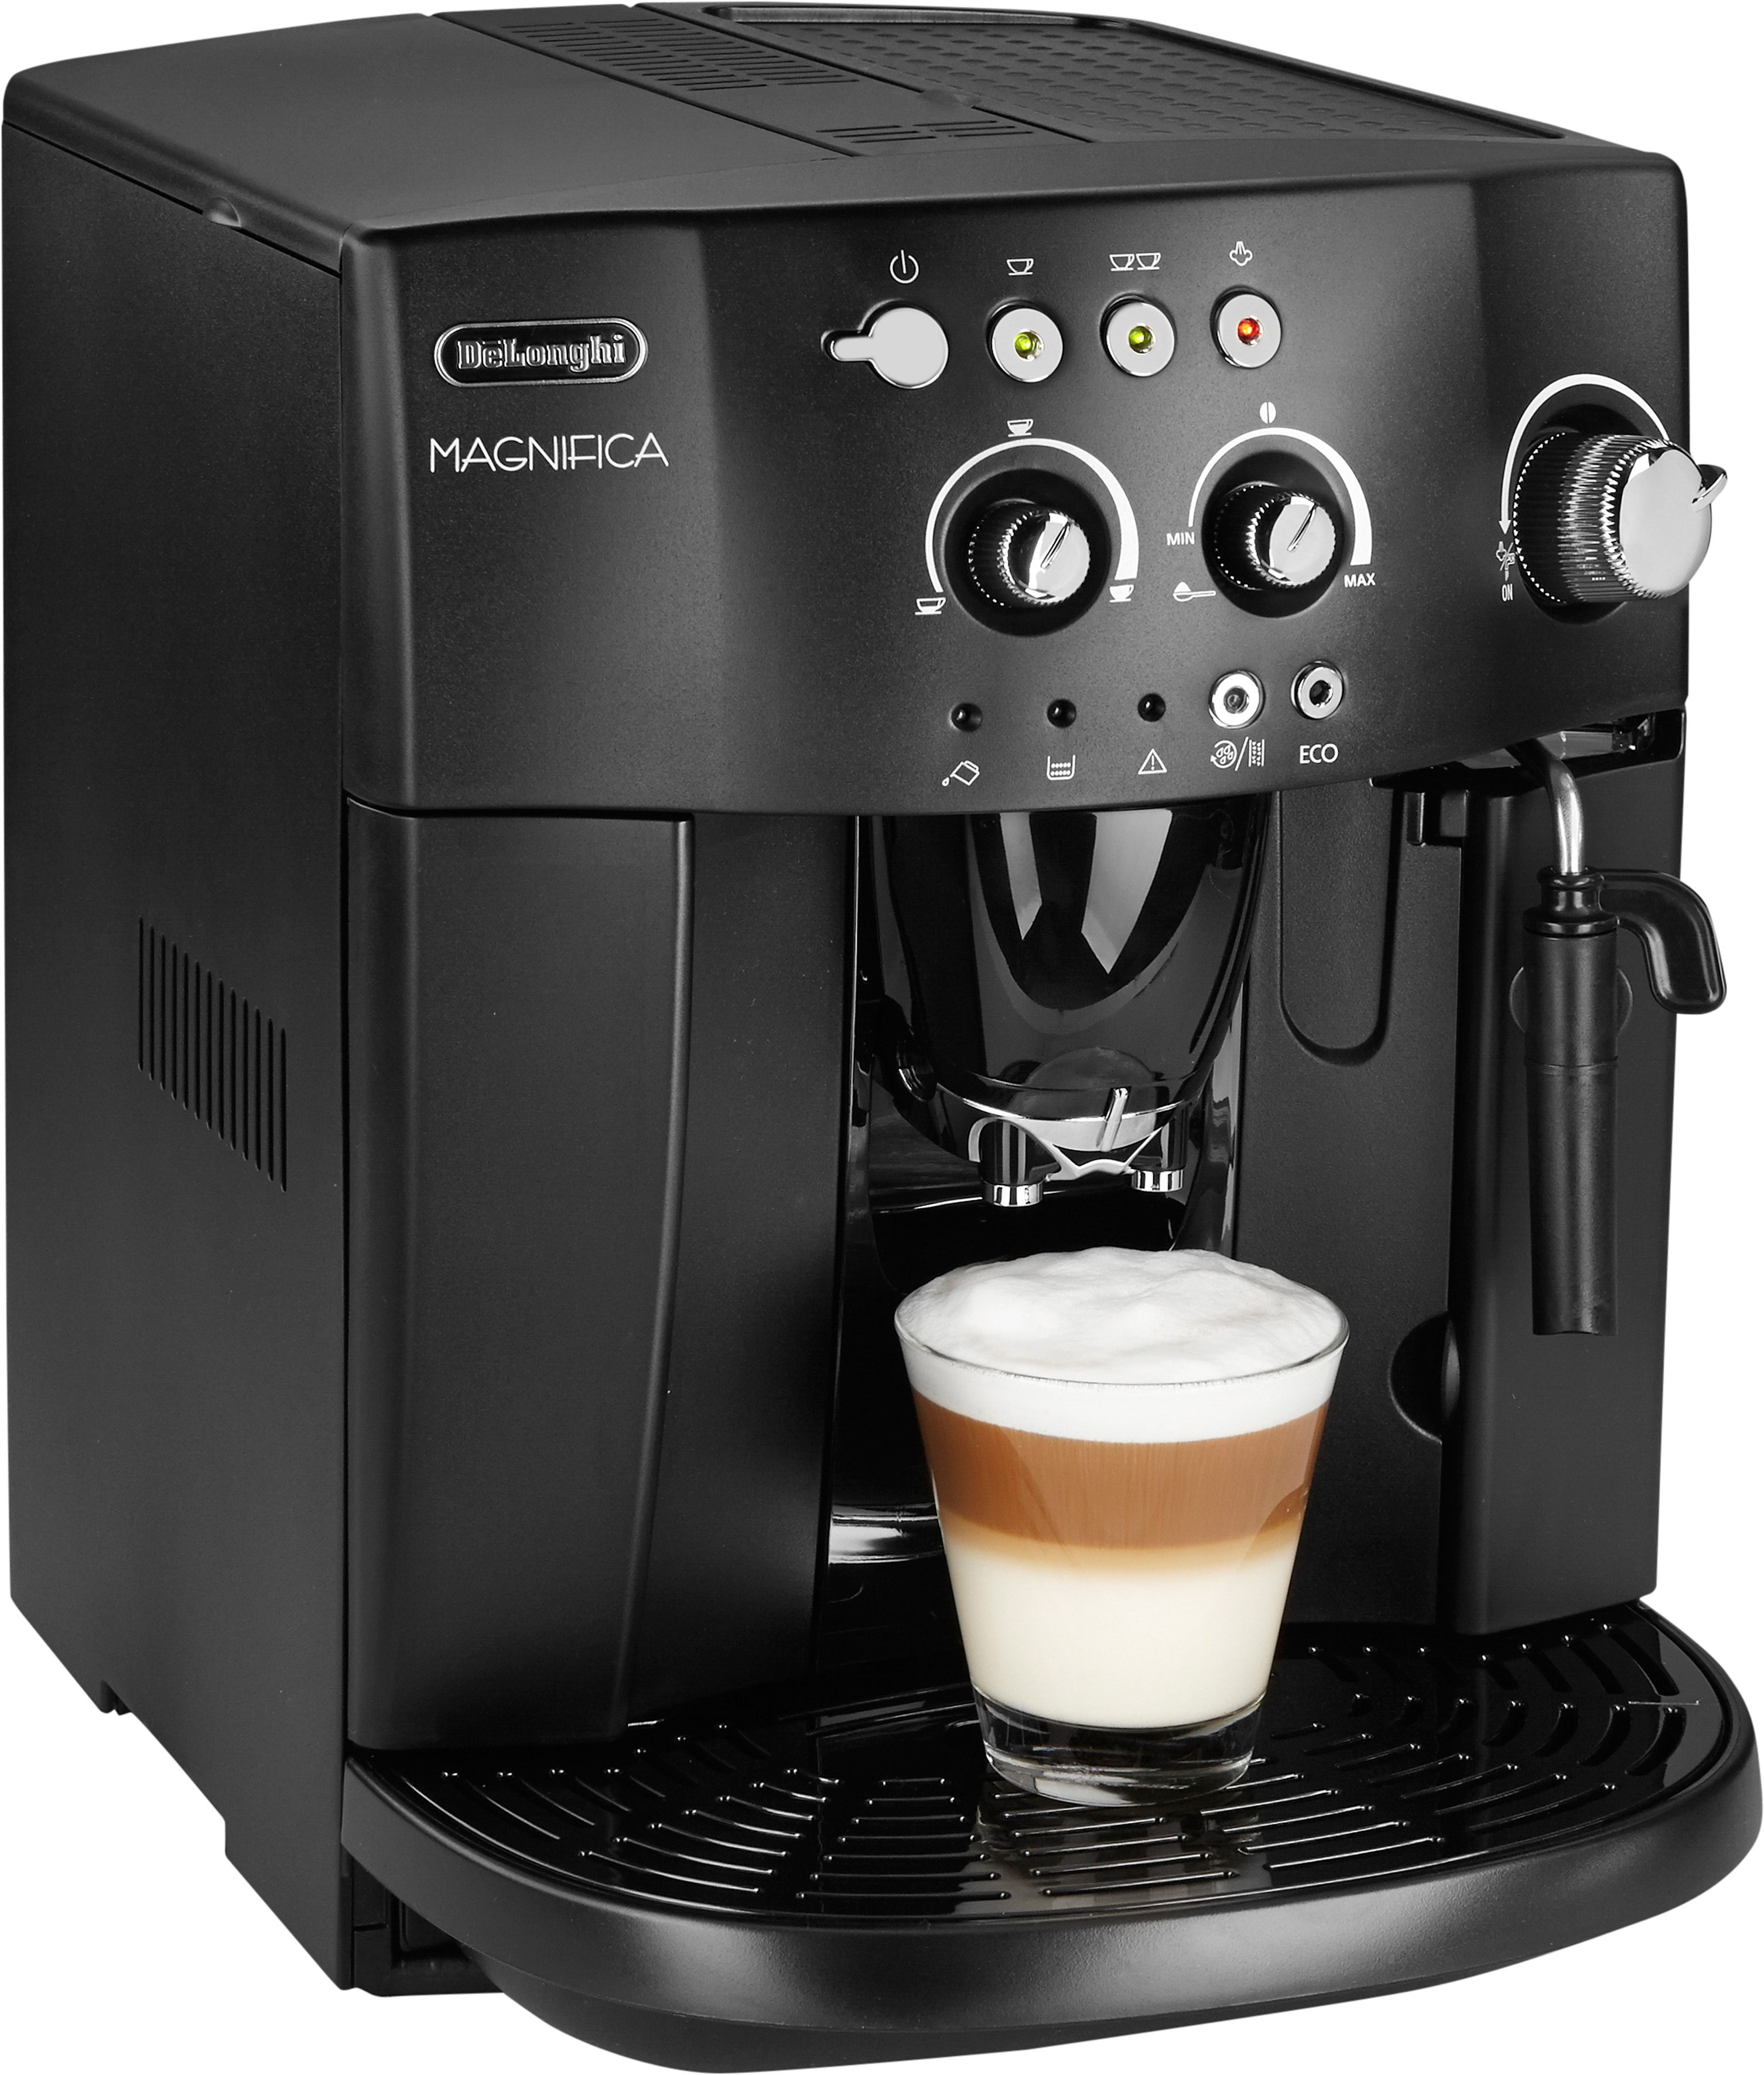 De'Longhi Kaffeevollautomat Magnifica ESAM 4008, Extra leises Kegelmahlwerk